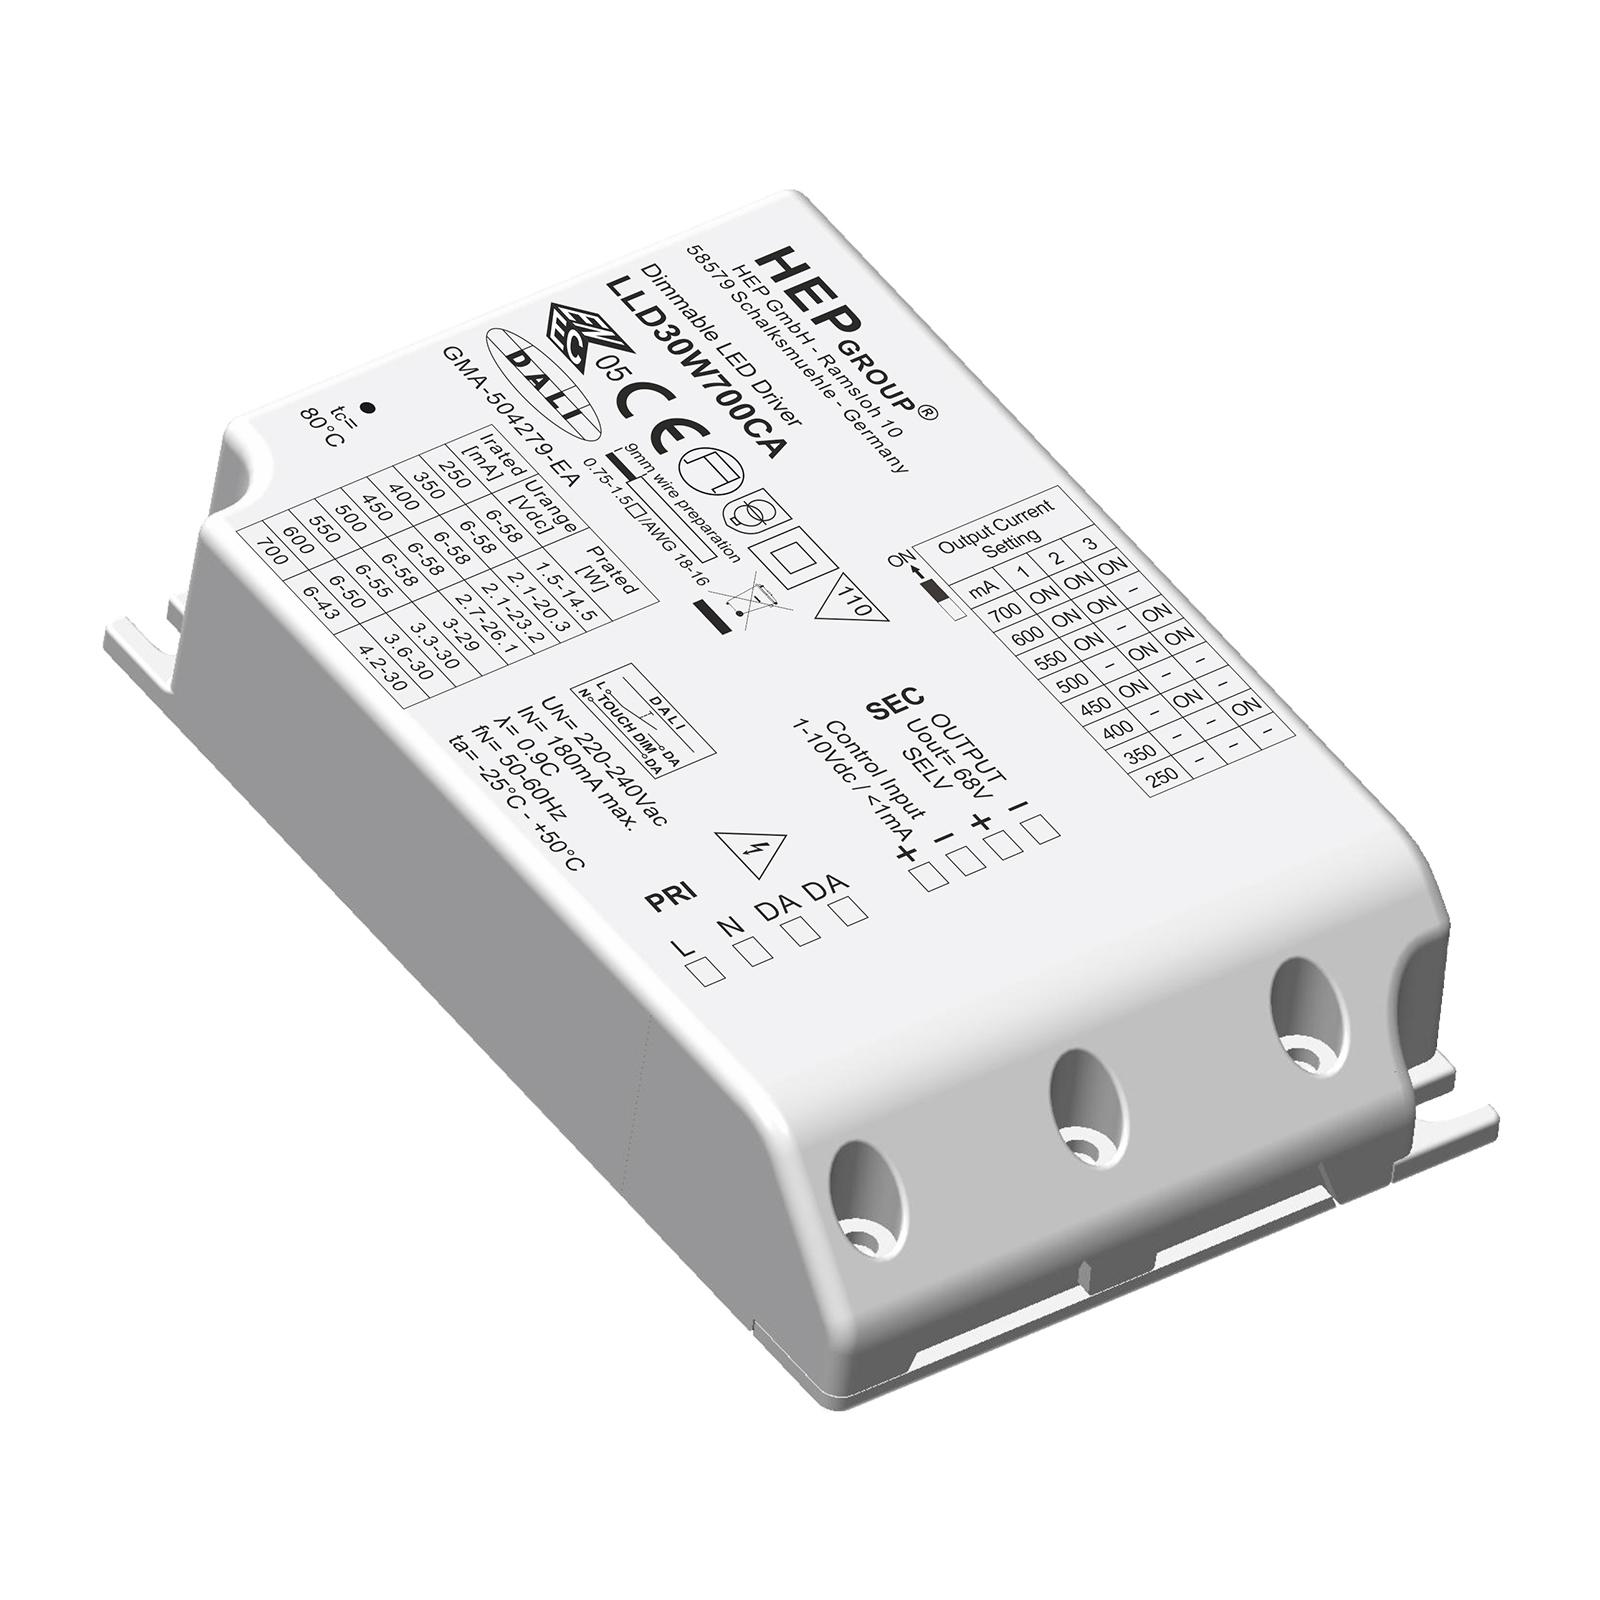 LED-Treiber LLD, 30 W, 900 mA, dimmbar, CC